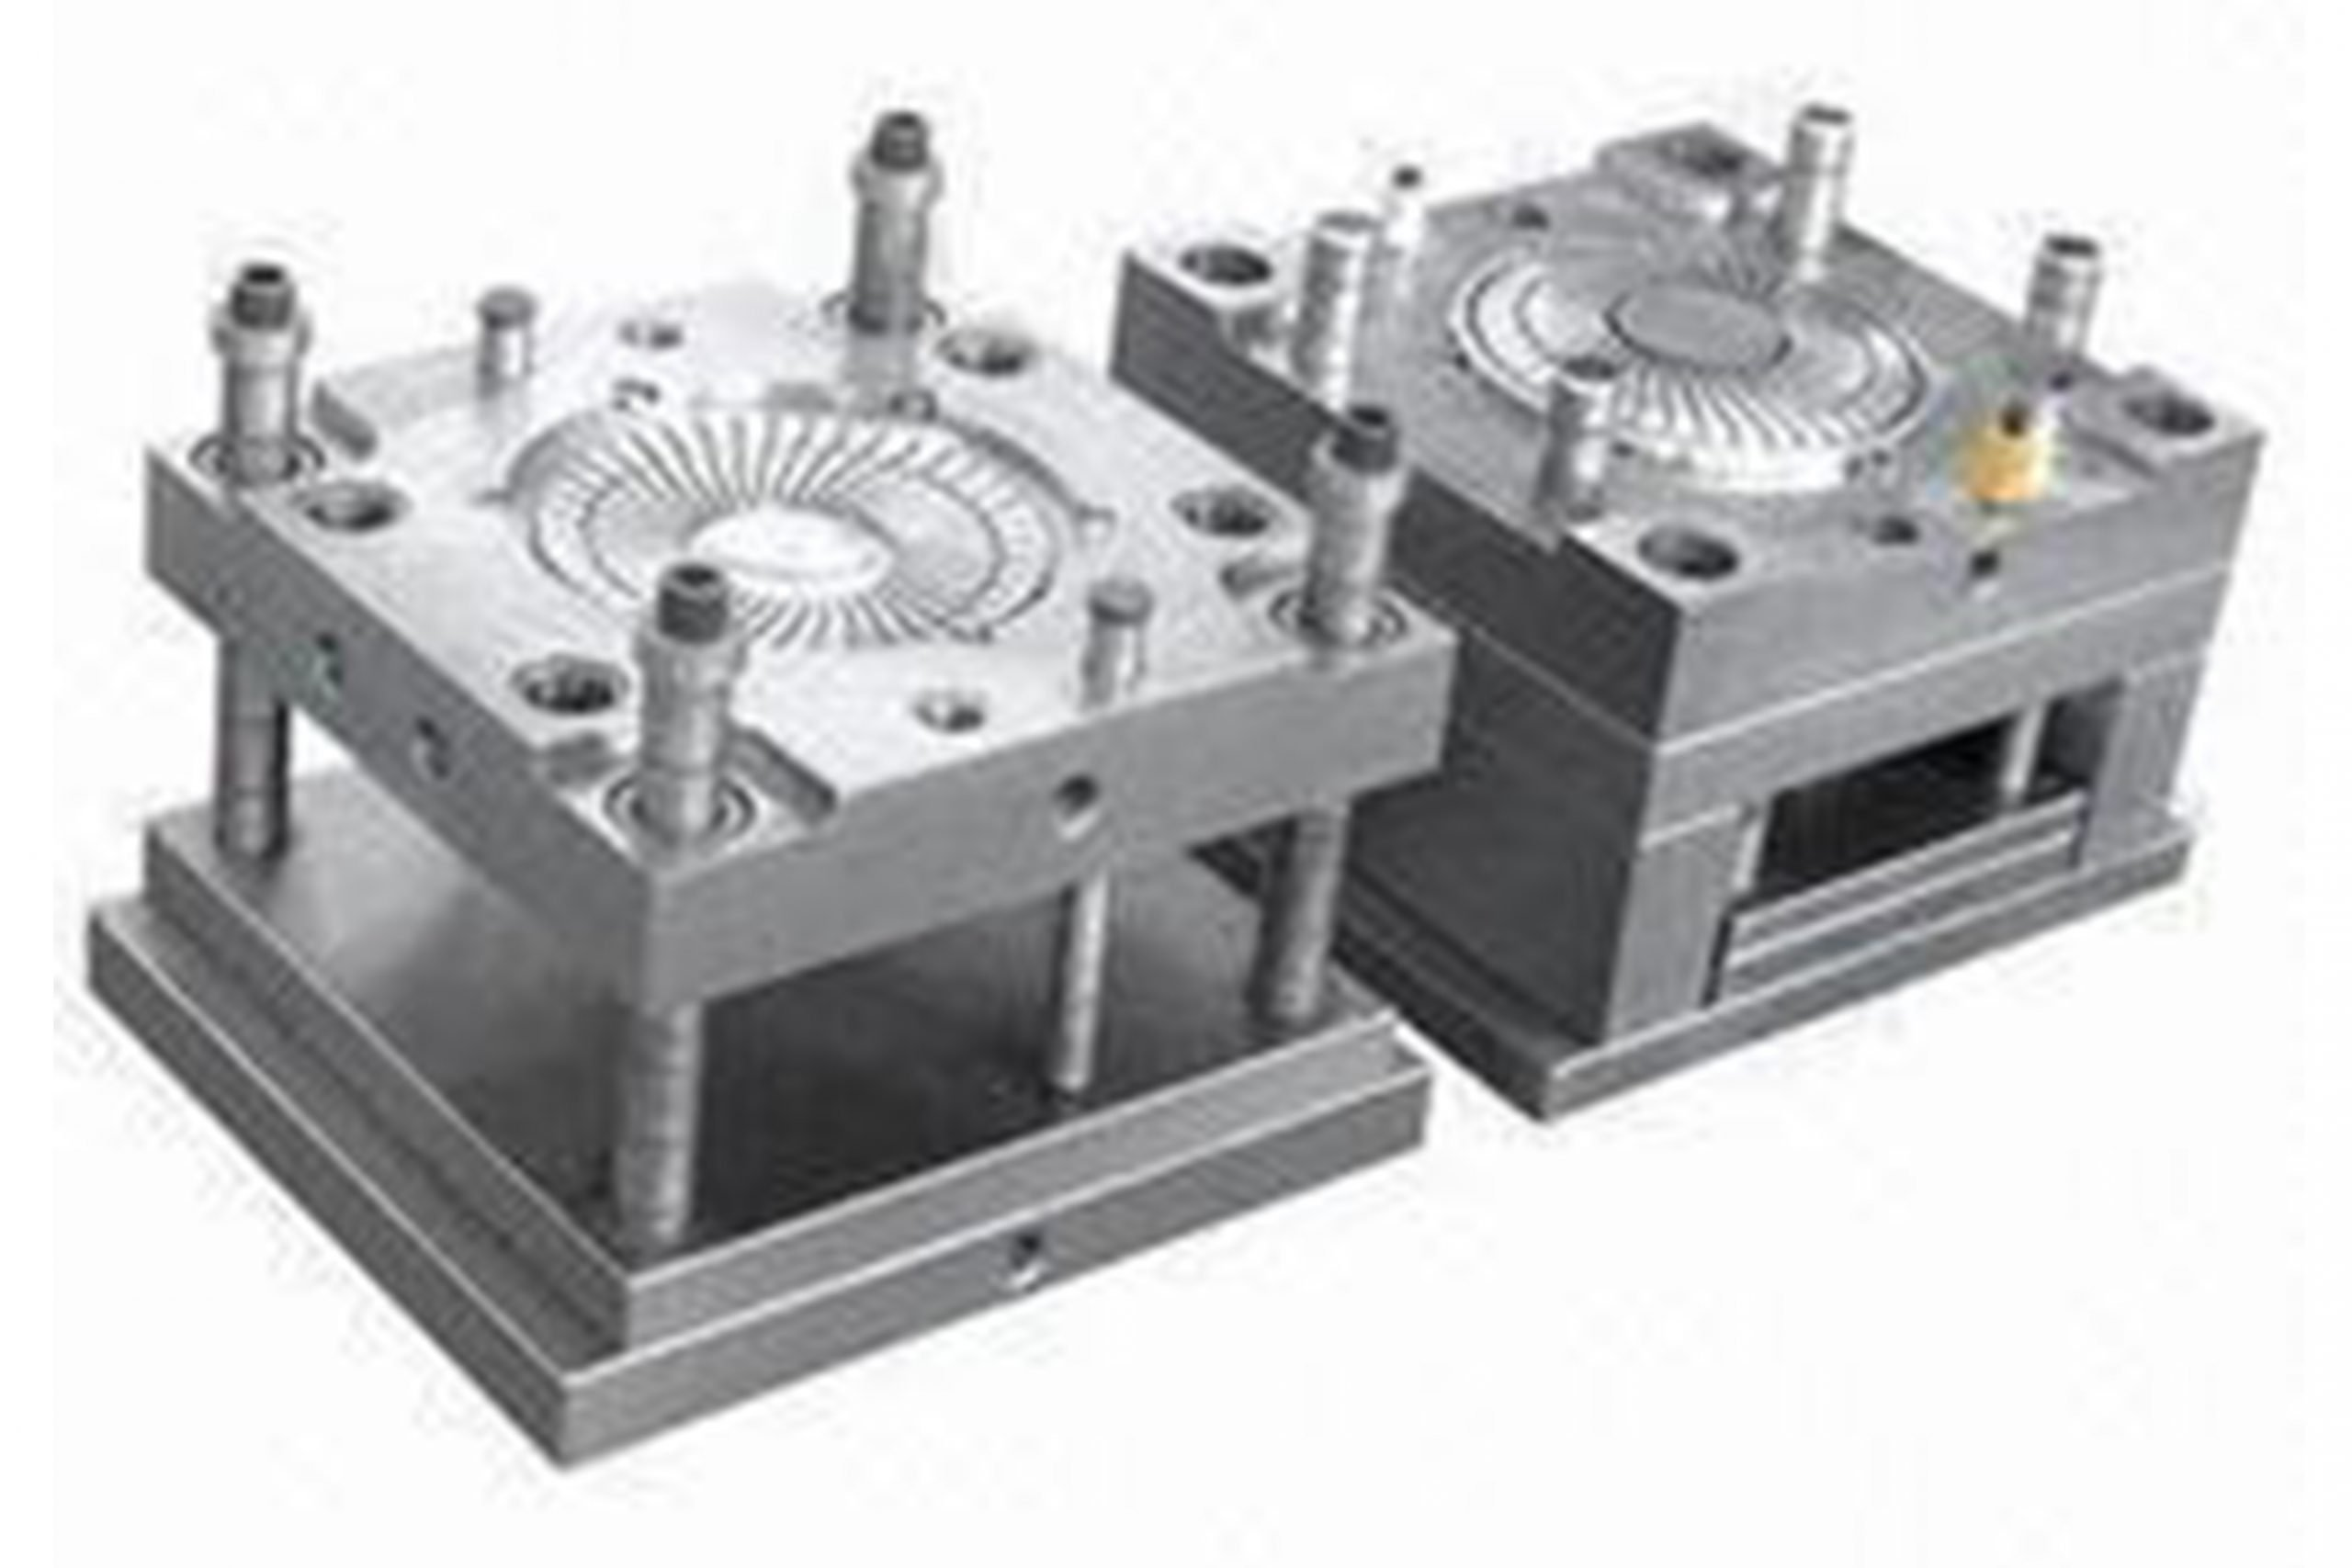 PP_0002_moulding-tools-mouldmaking